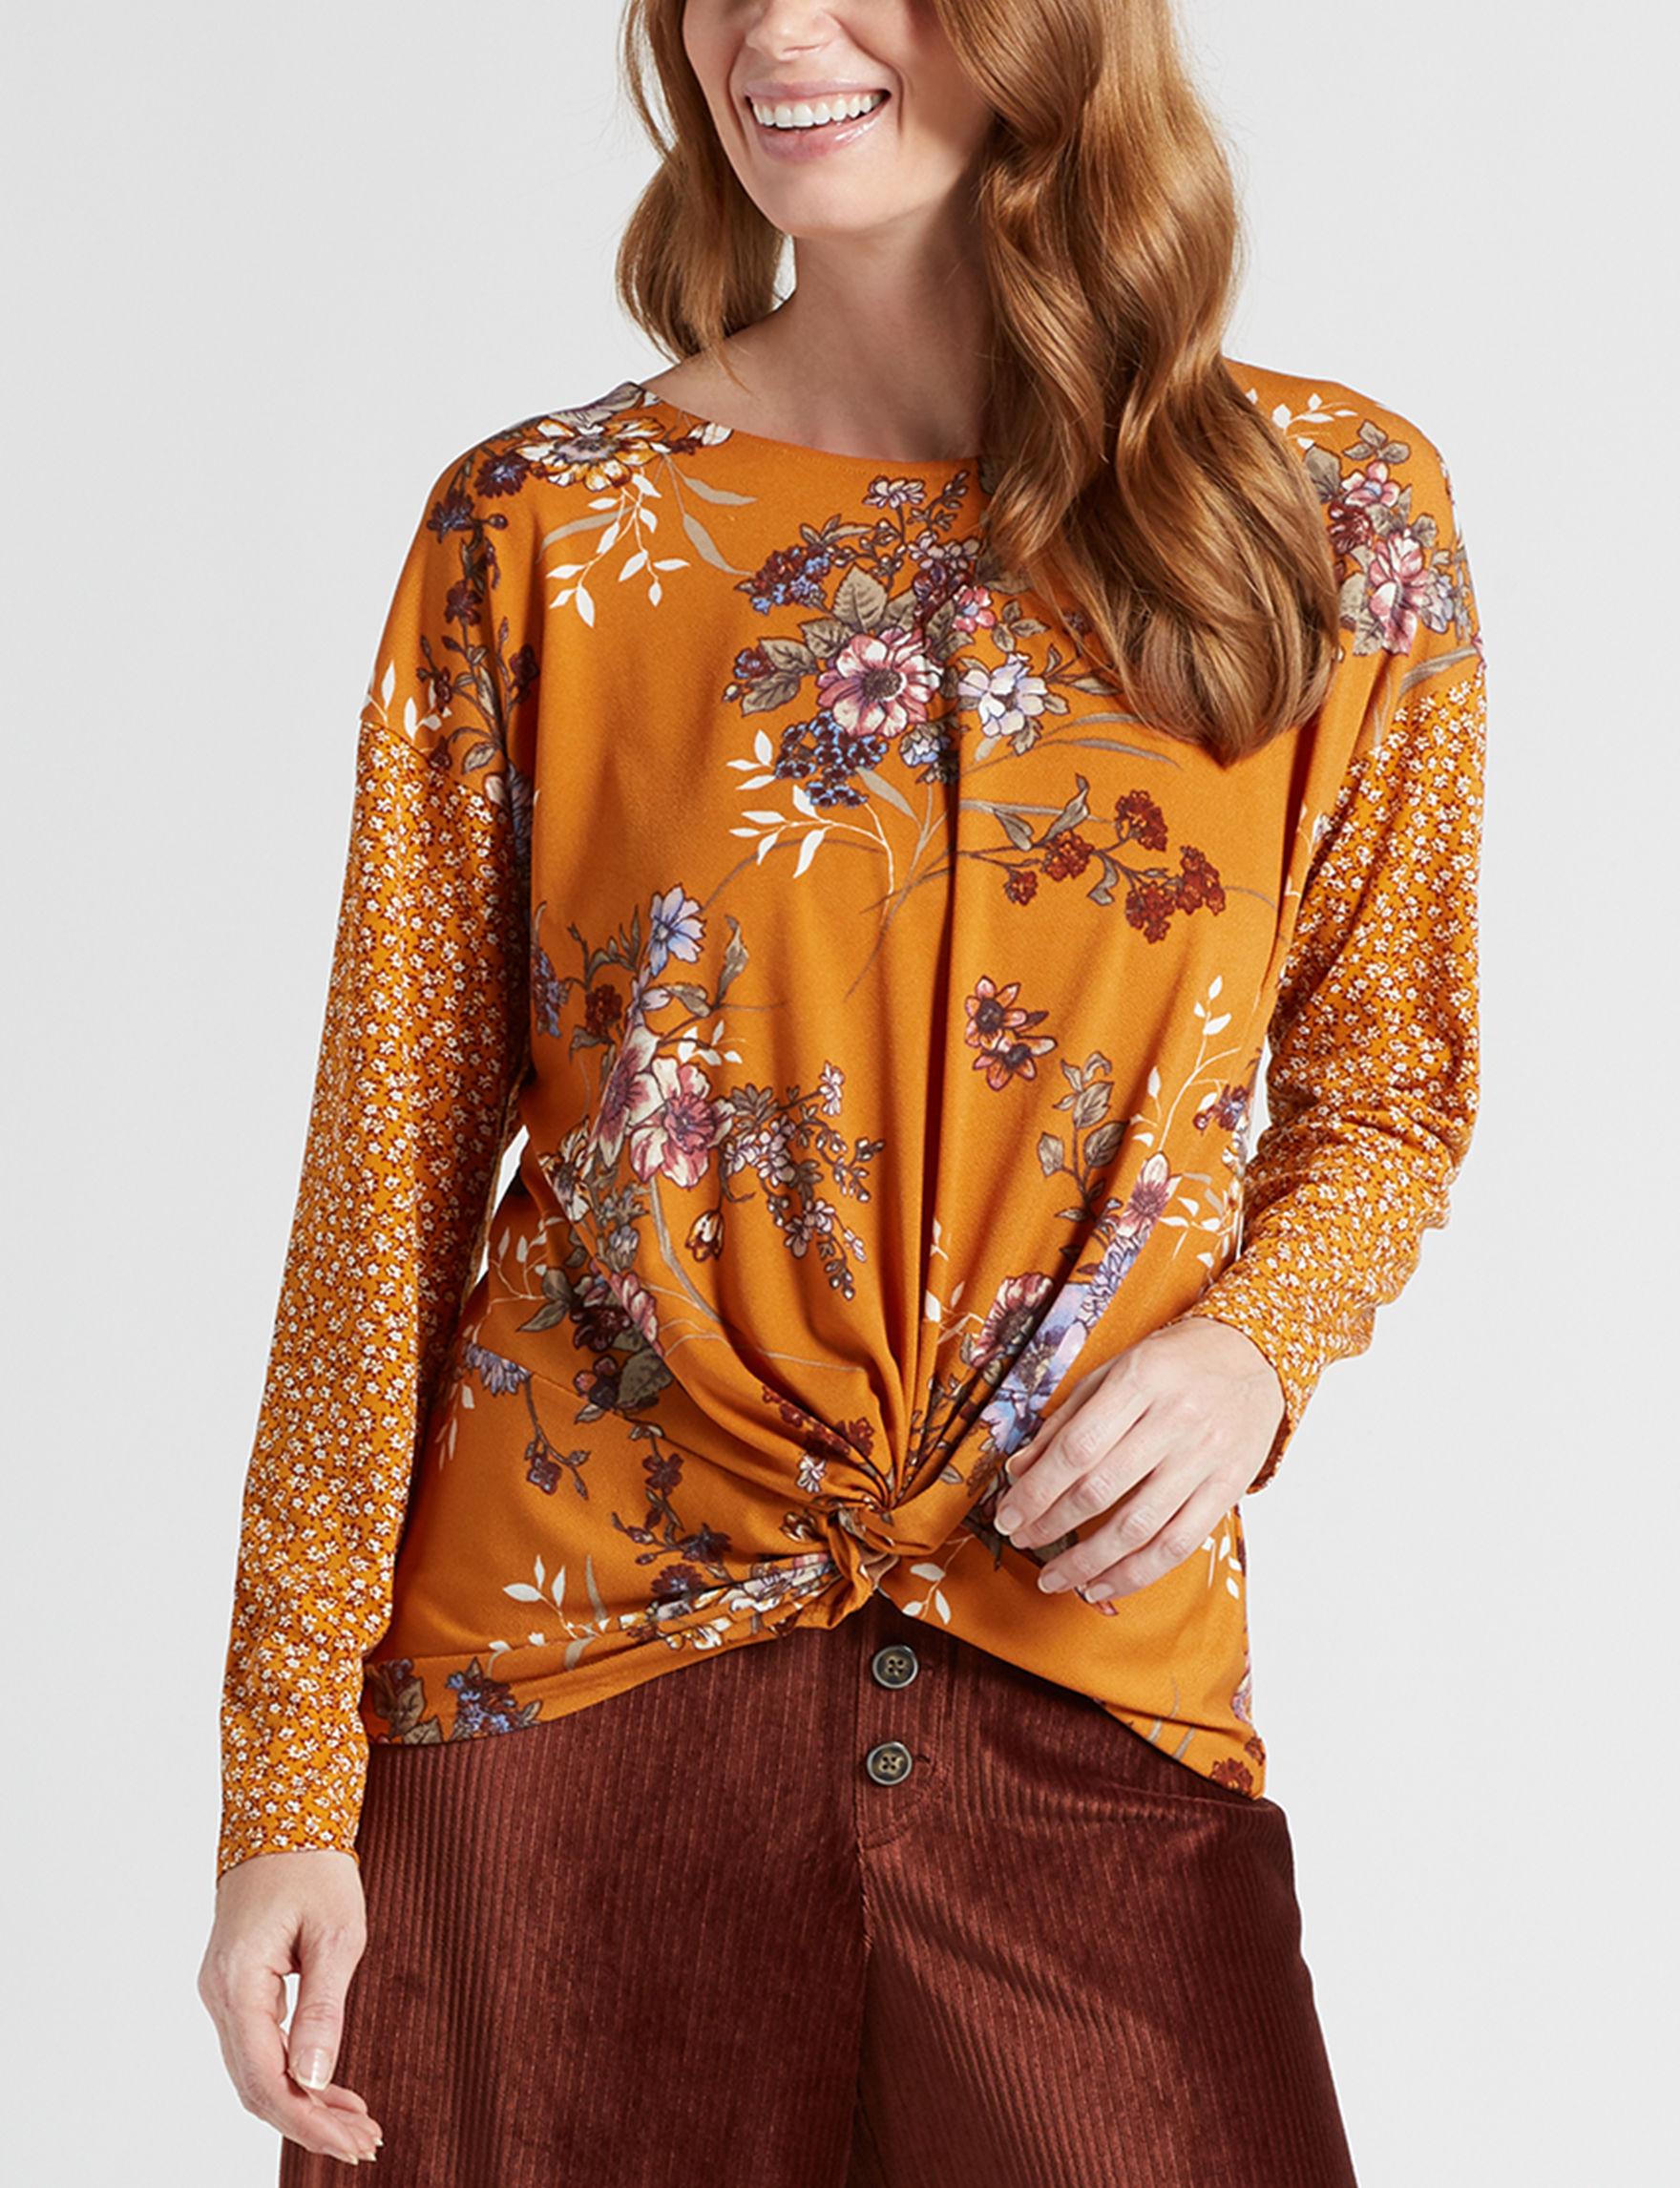 Signature Studio Mustard Floral Shirts & Blouses